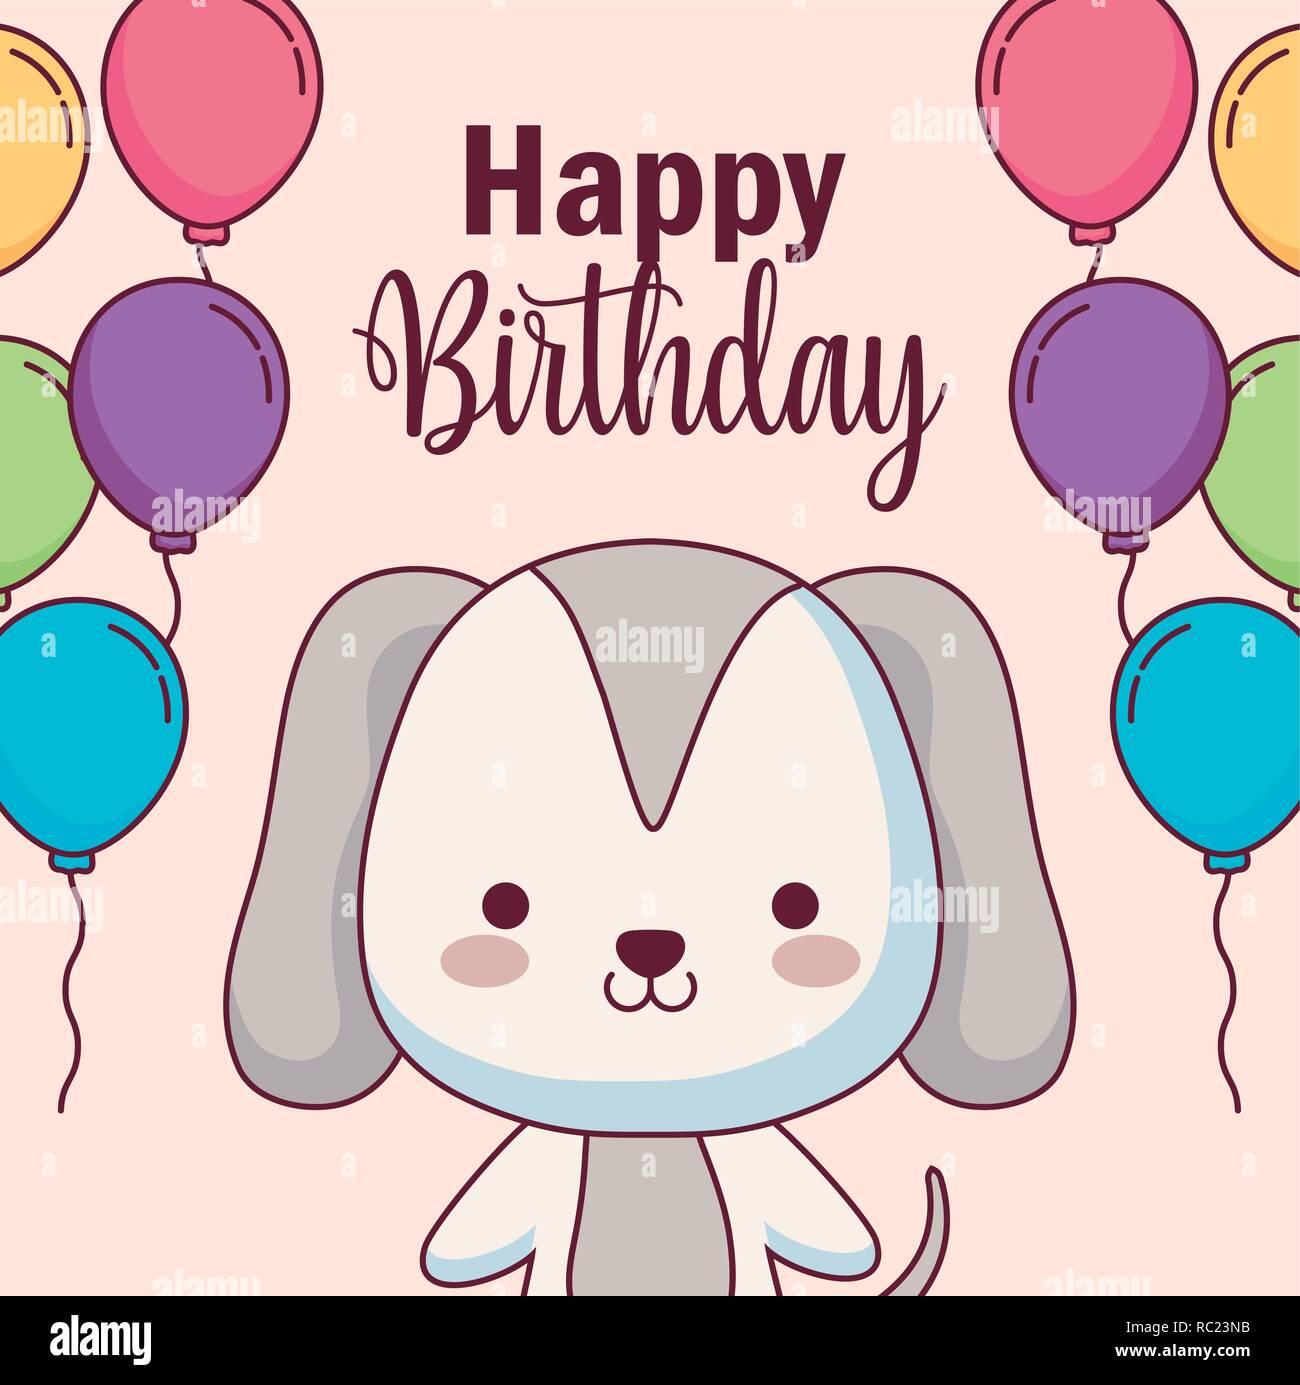 Susser Hund Happy Birthday Karte Mit Ballons Helium Vector Illustration Design Stock Vektorgrafik Alamy